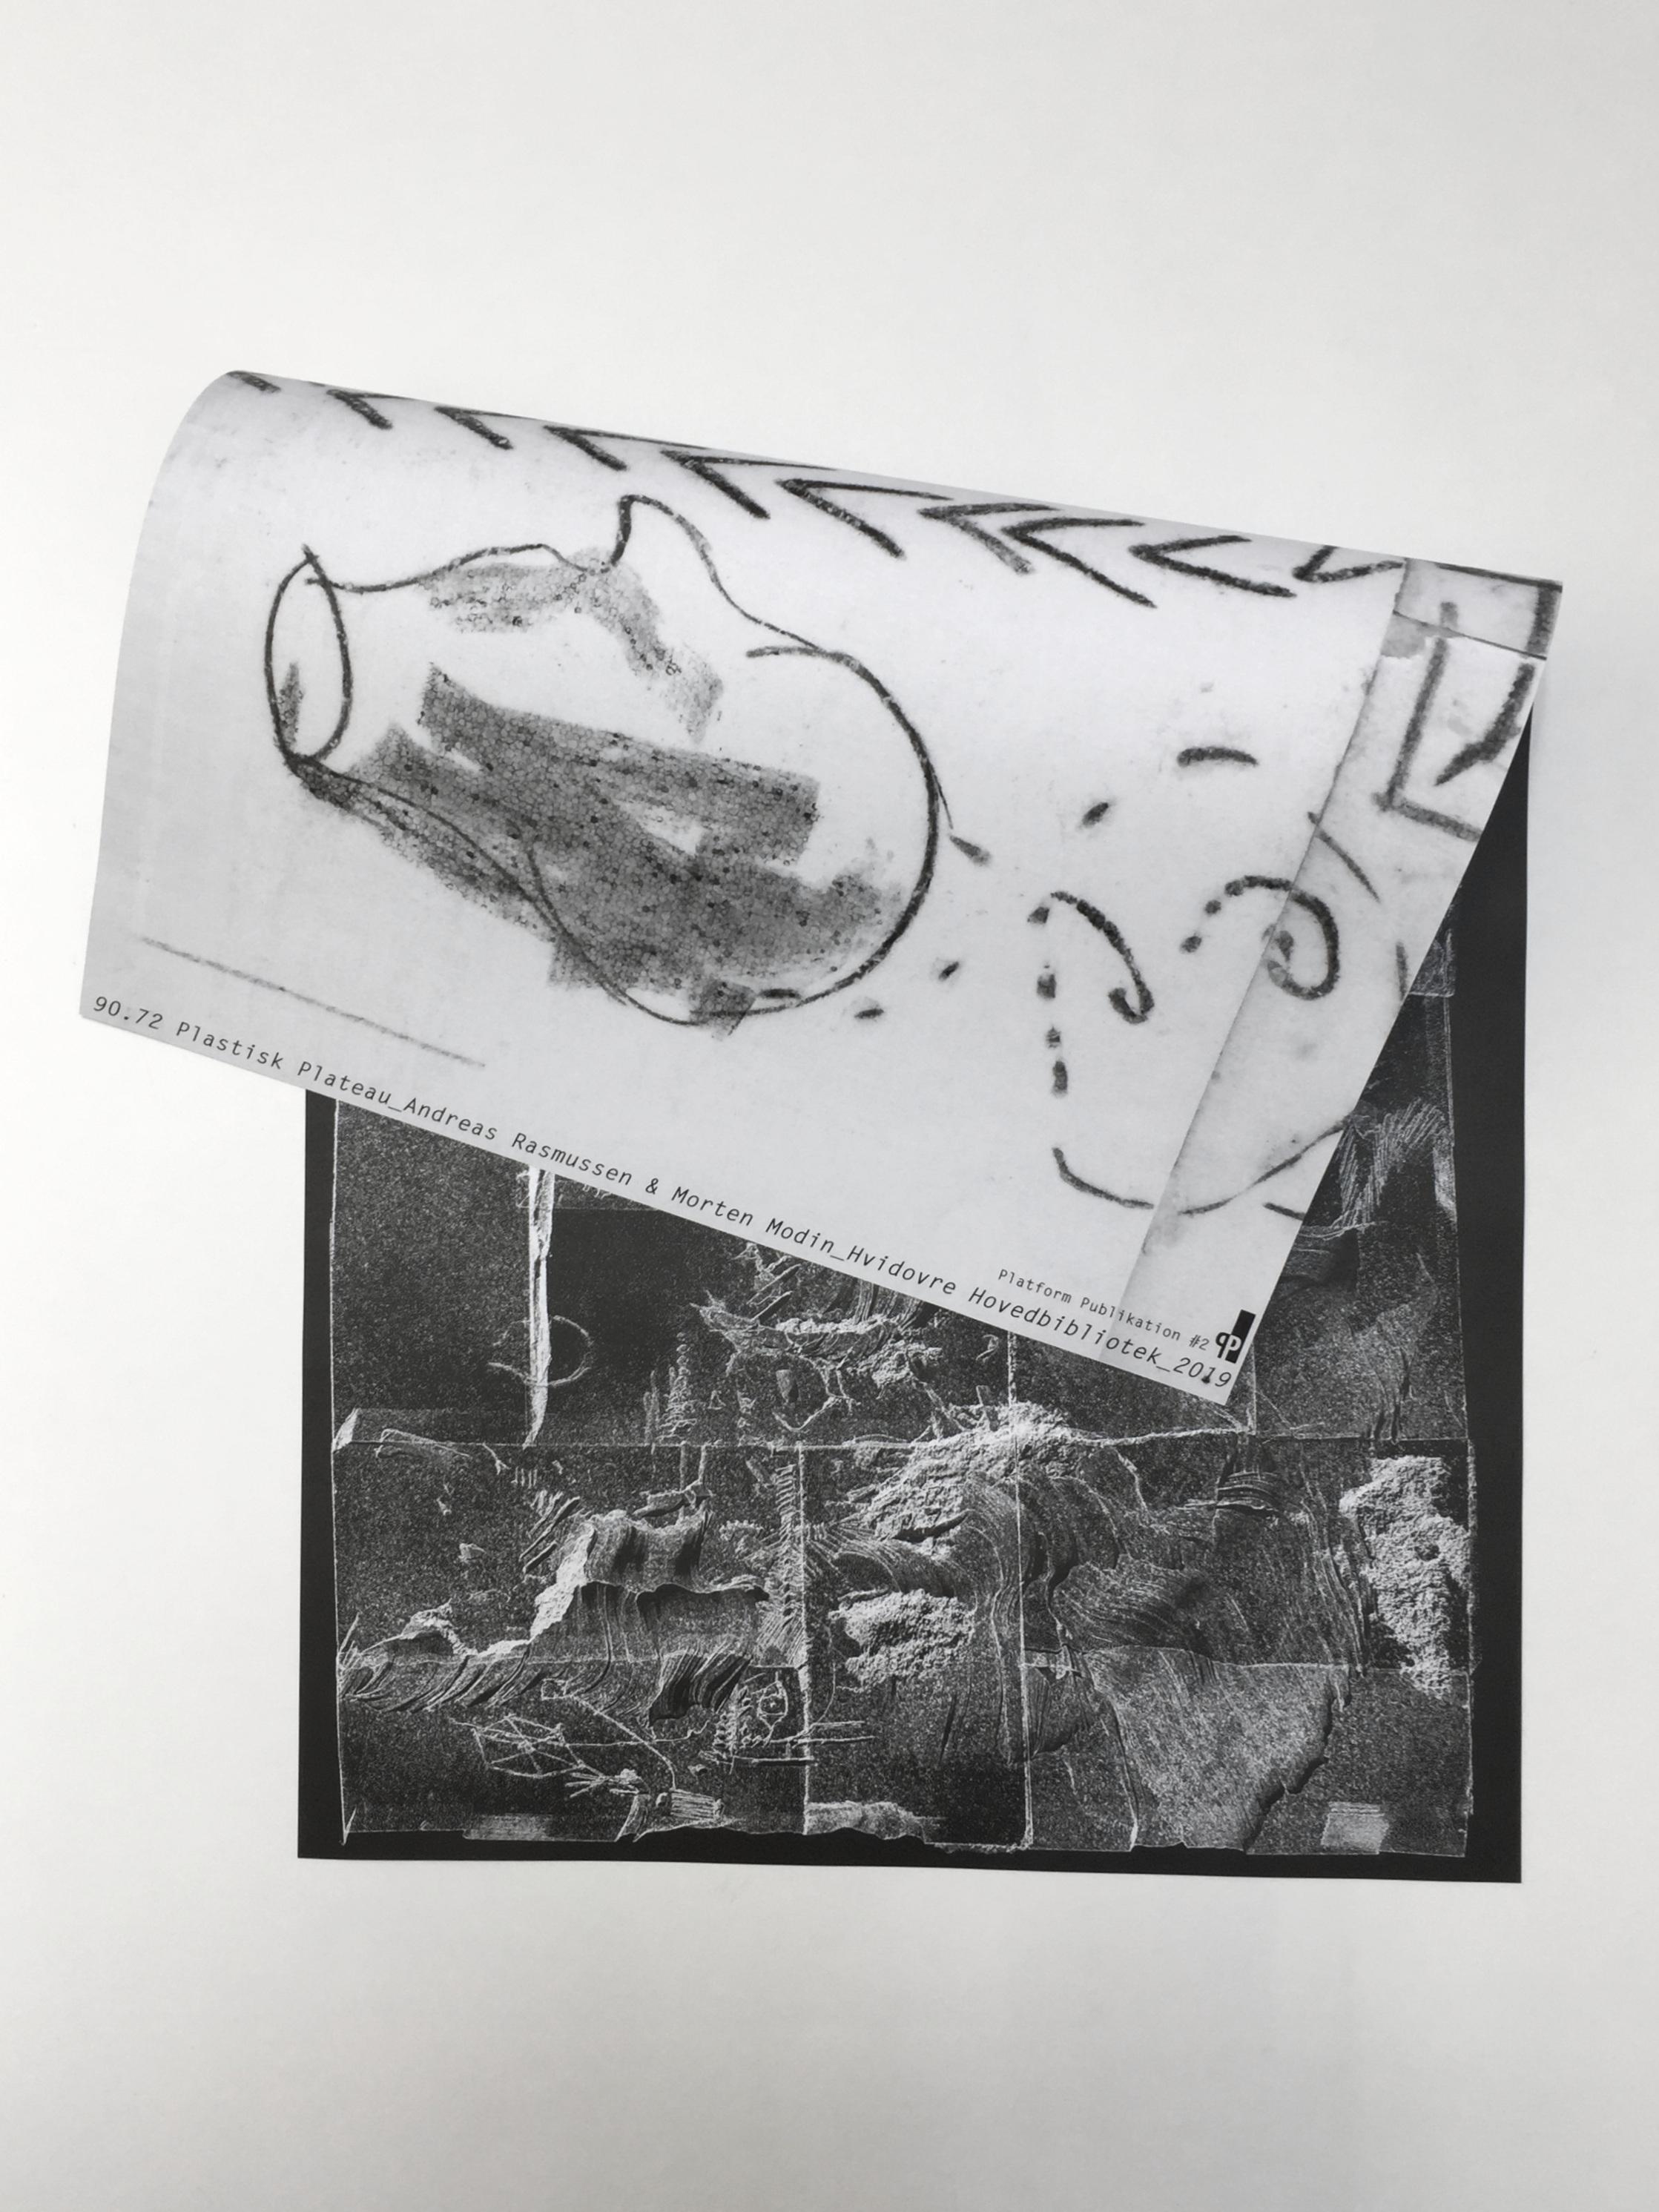 90.72 Plastisk Plateau« A collaborative sculpture project with Morten Modin, Styrofoam, neon light, charcoal drawing…Hvidovre Hovedbibliotek, DK -